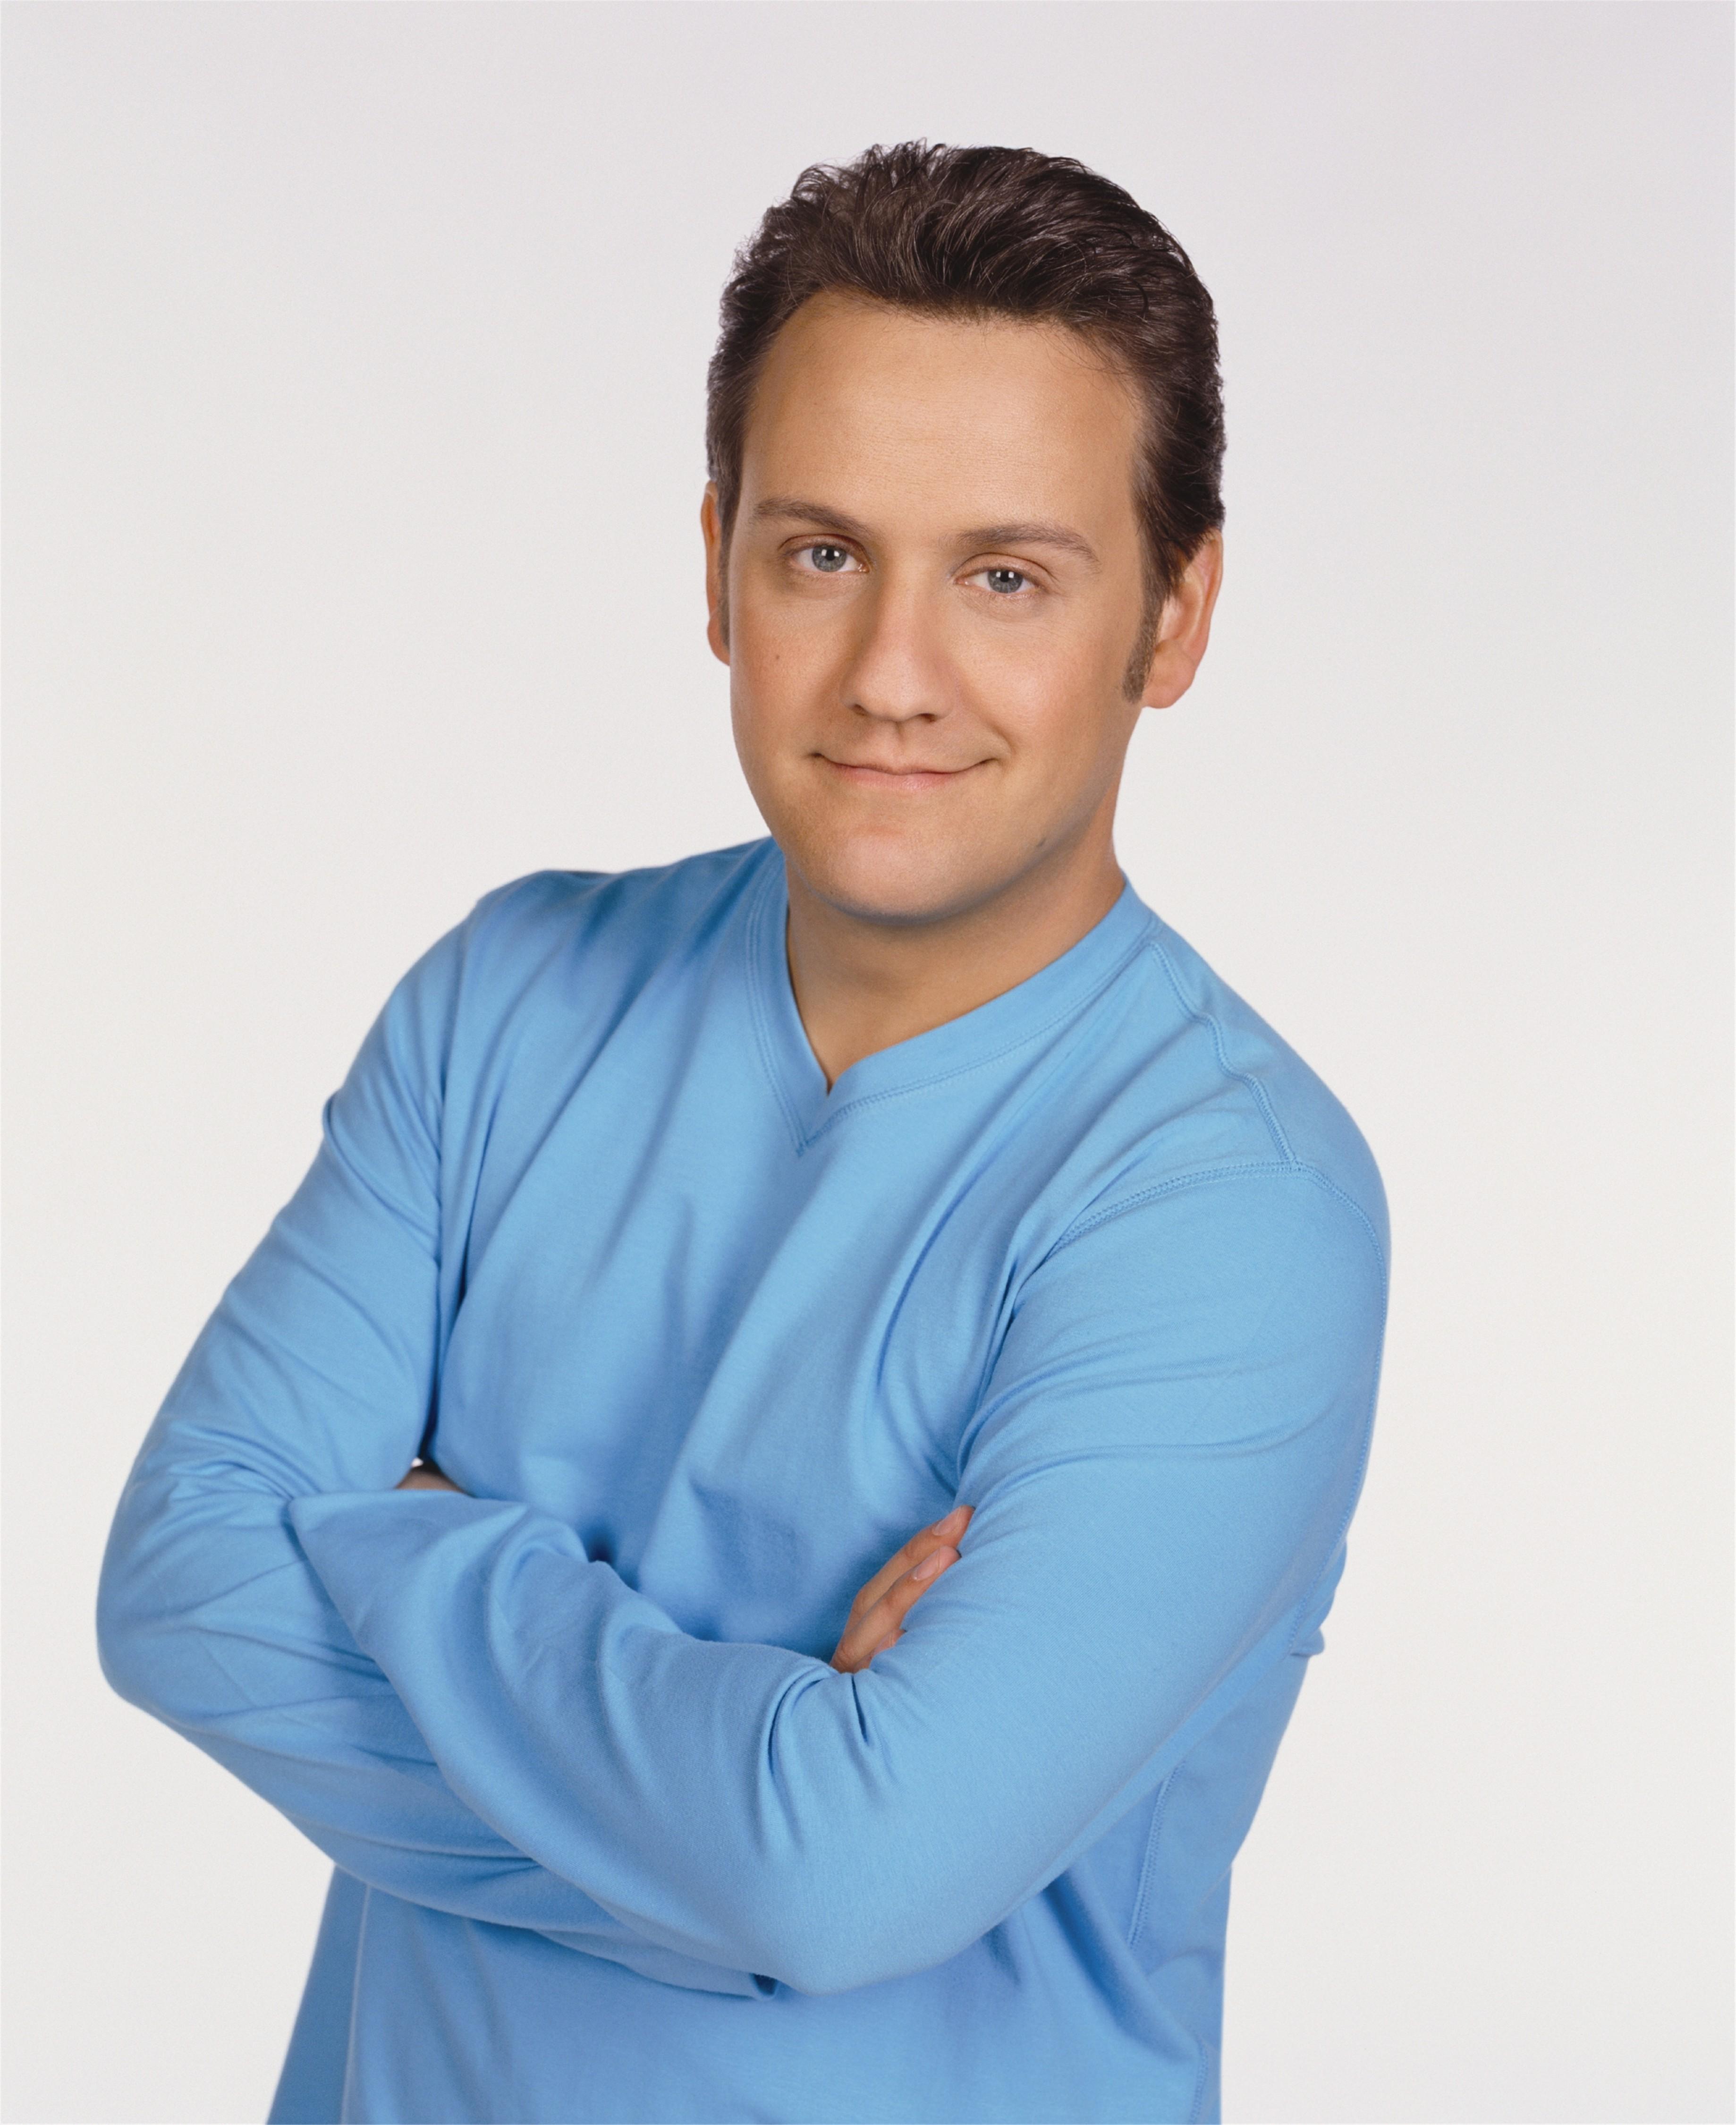 Comedian Frank Nicotero, Funny TV Host